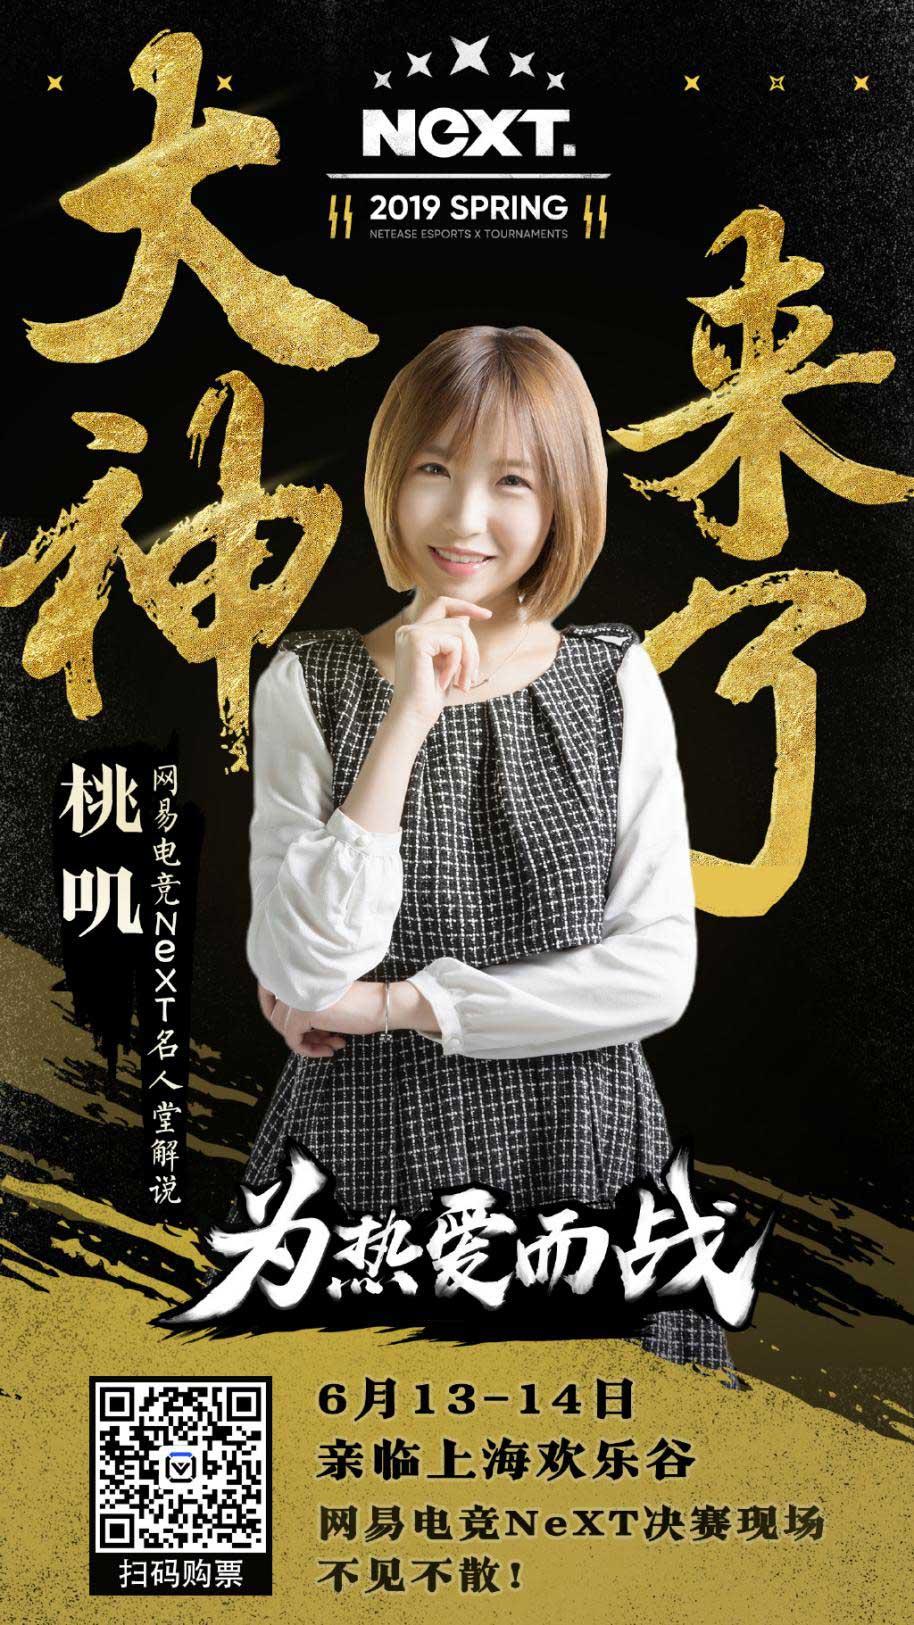 "NeXT OW官方解说""桃叽""专访:我一直热爱着守望先锋"